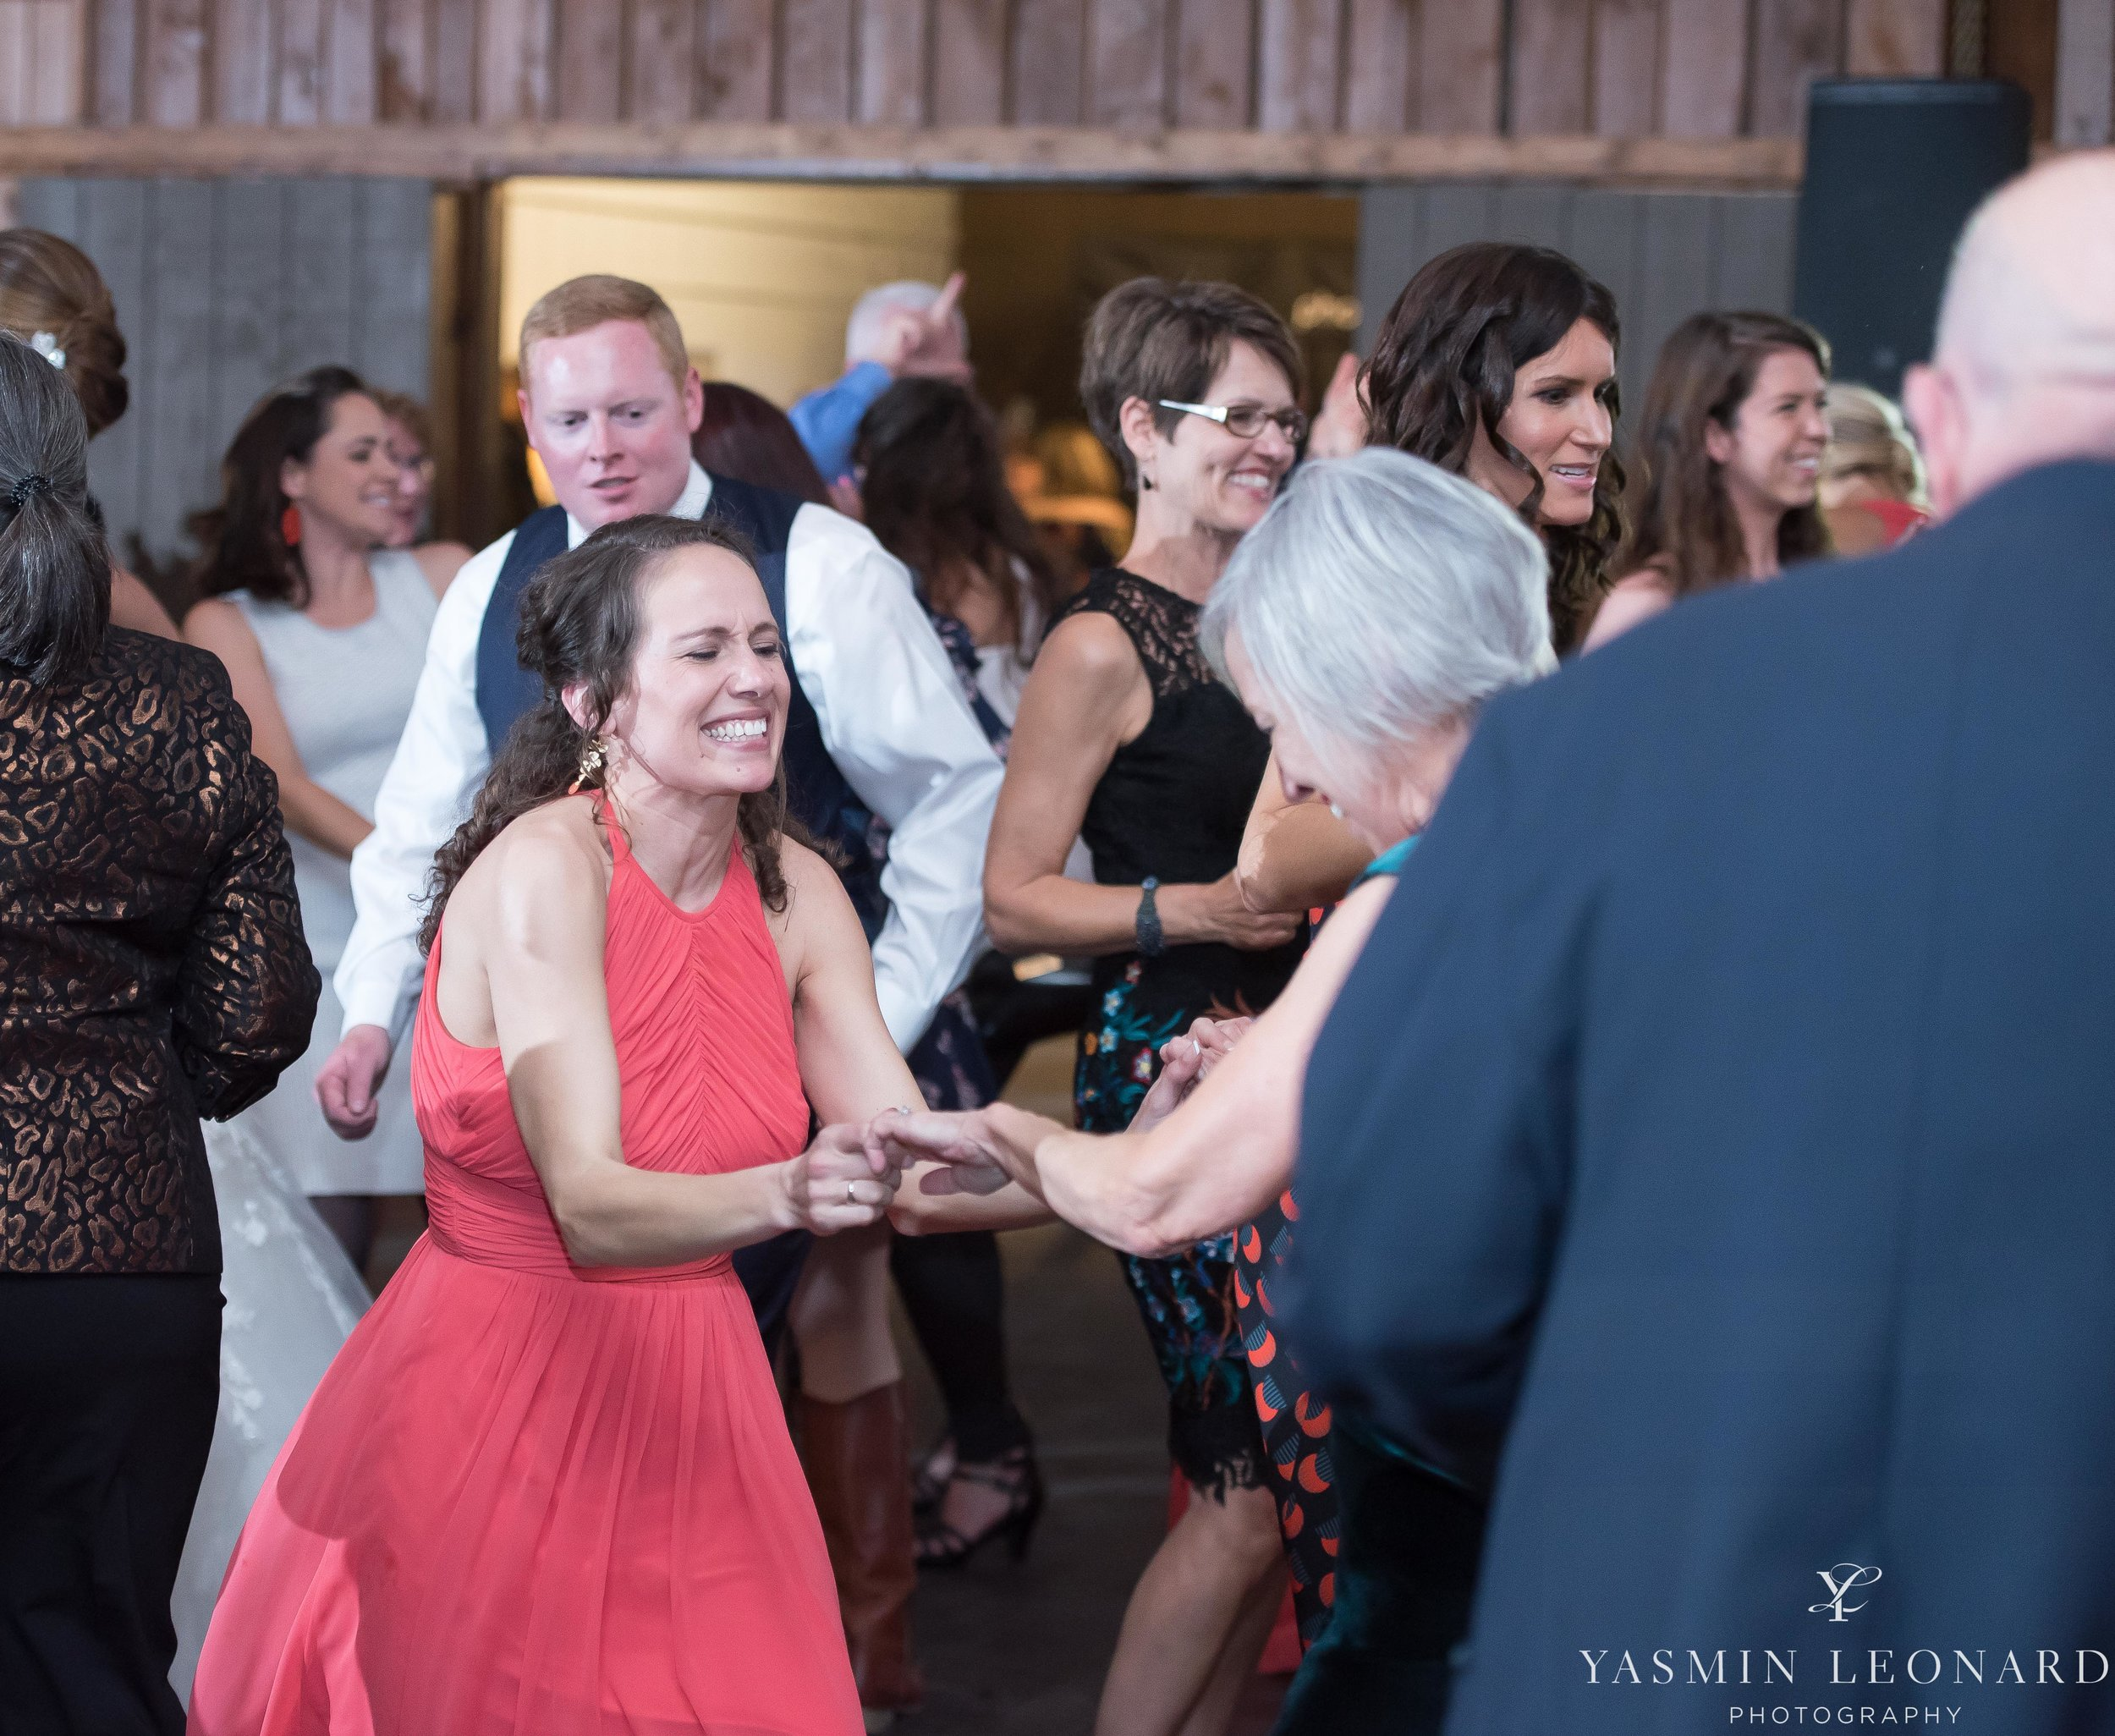 Adaumont Farm - Adaumont Farm Weddings - Trinity Weddings - NC Weddings - Yasmin Leonard Photography-76.jpg